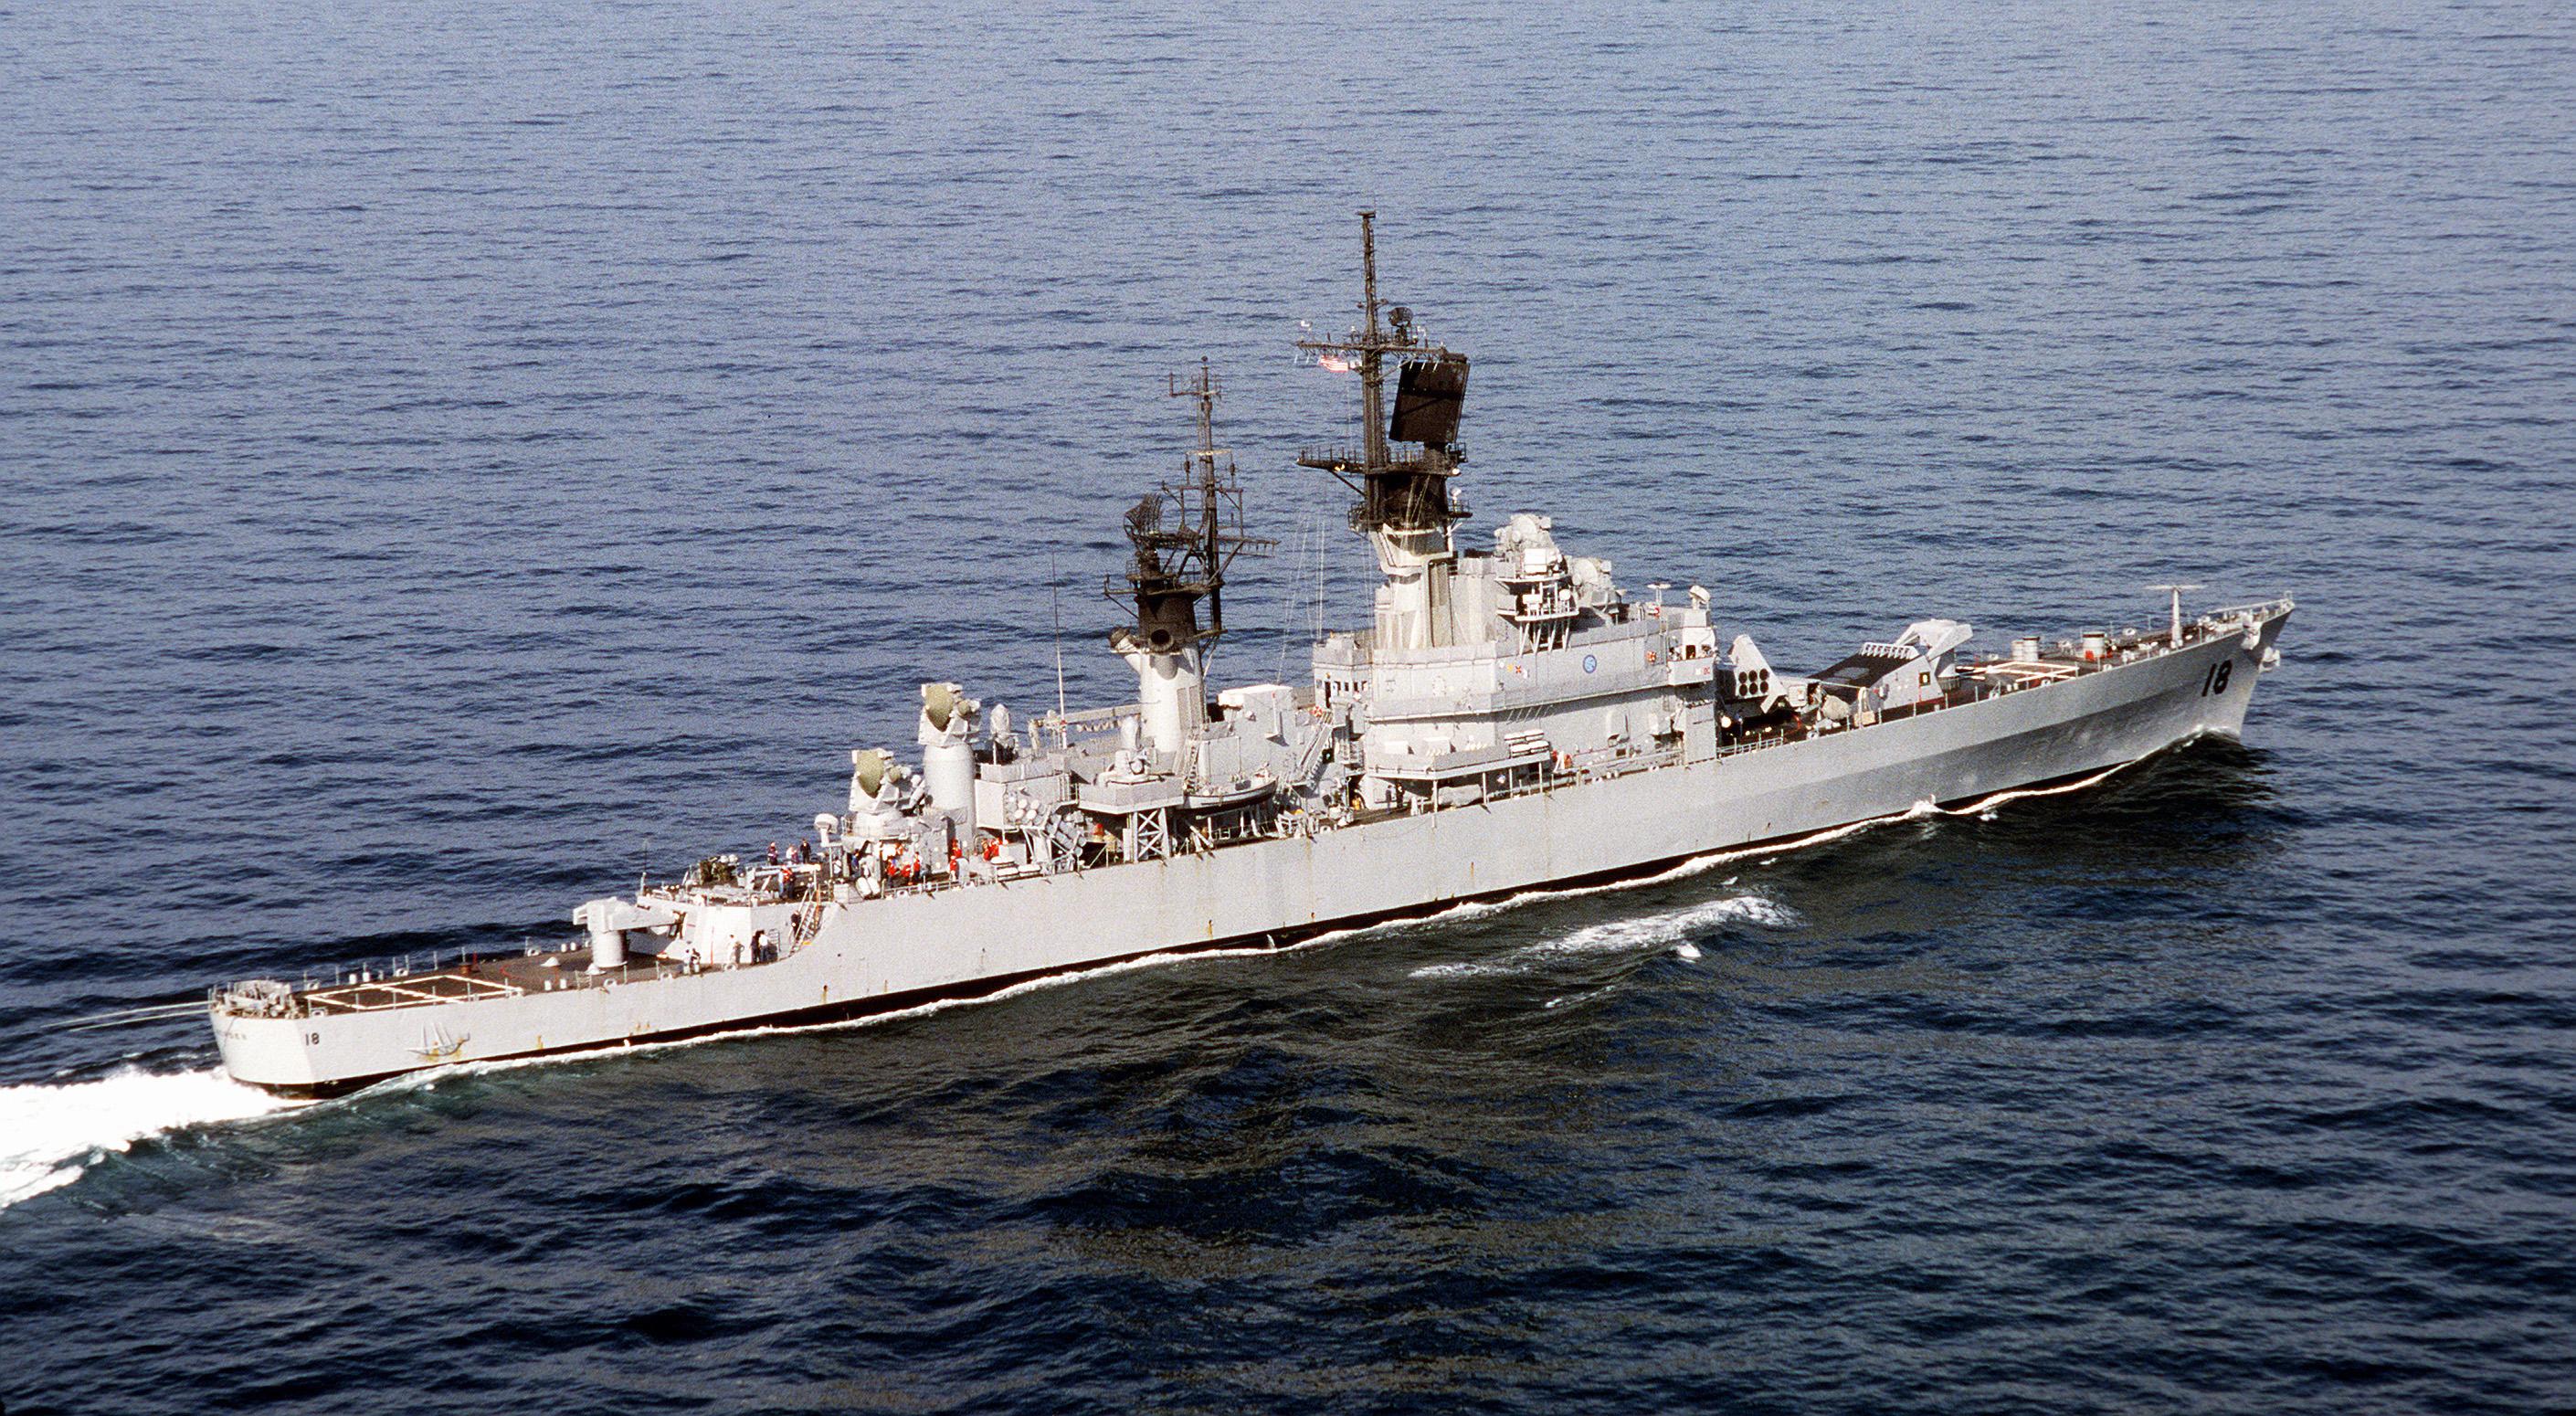 USS HALSEY DLG 23 Naval Ship Photo Print USN Navy